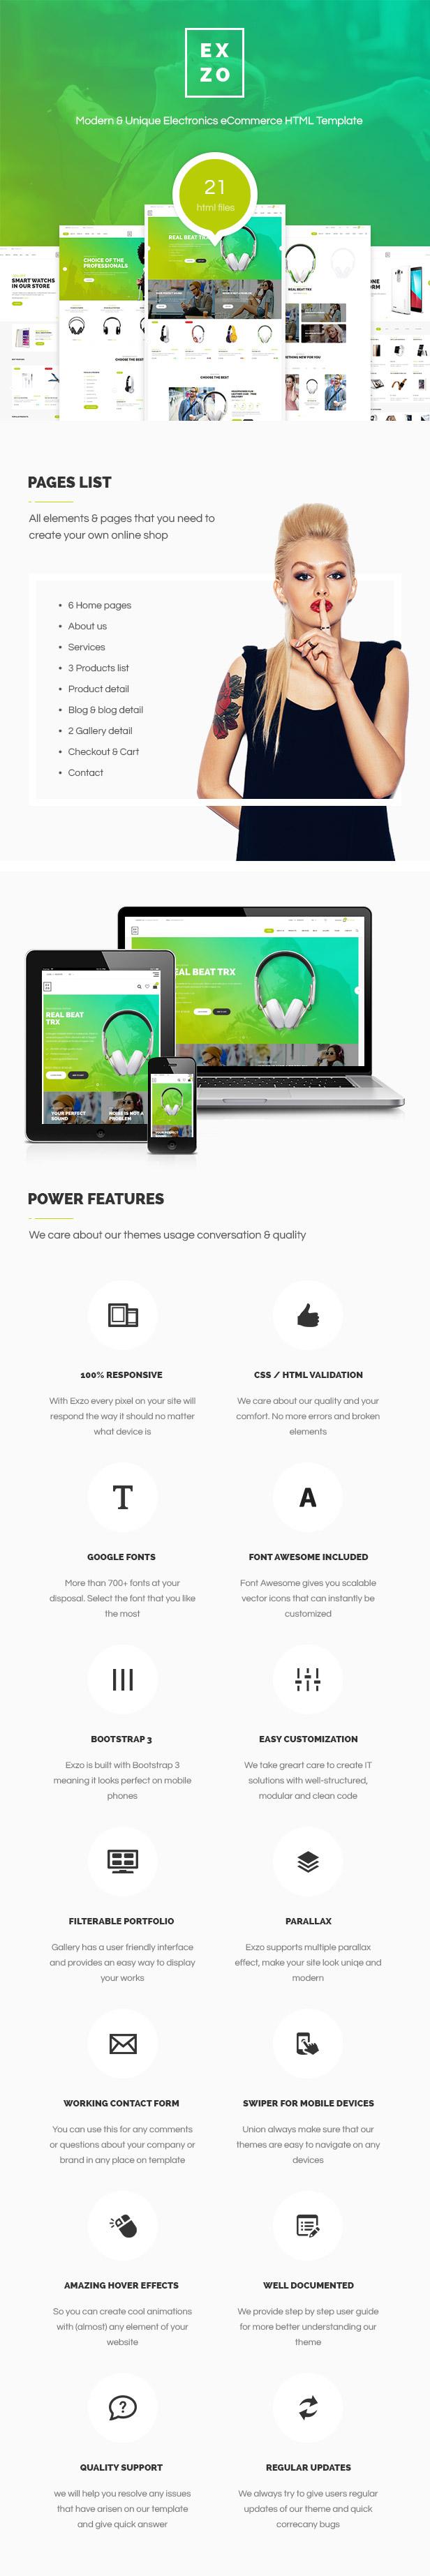 Exzo - Modern & Unique Electronics eCommerce HTML Template - 1